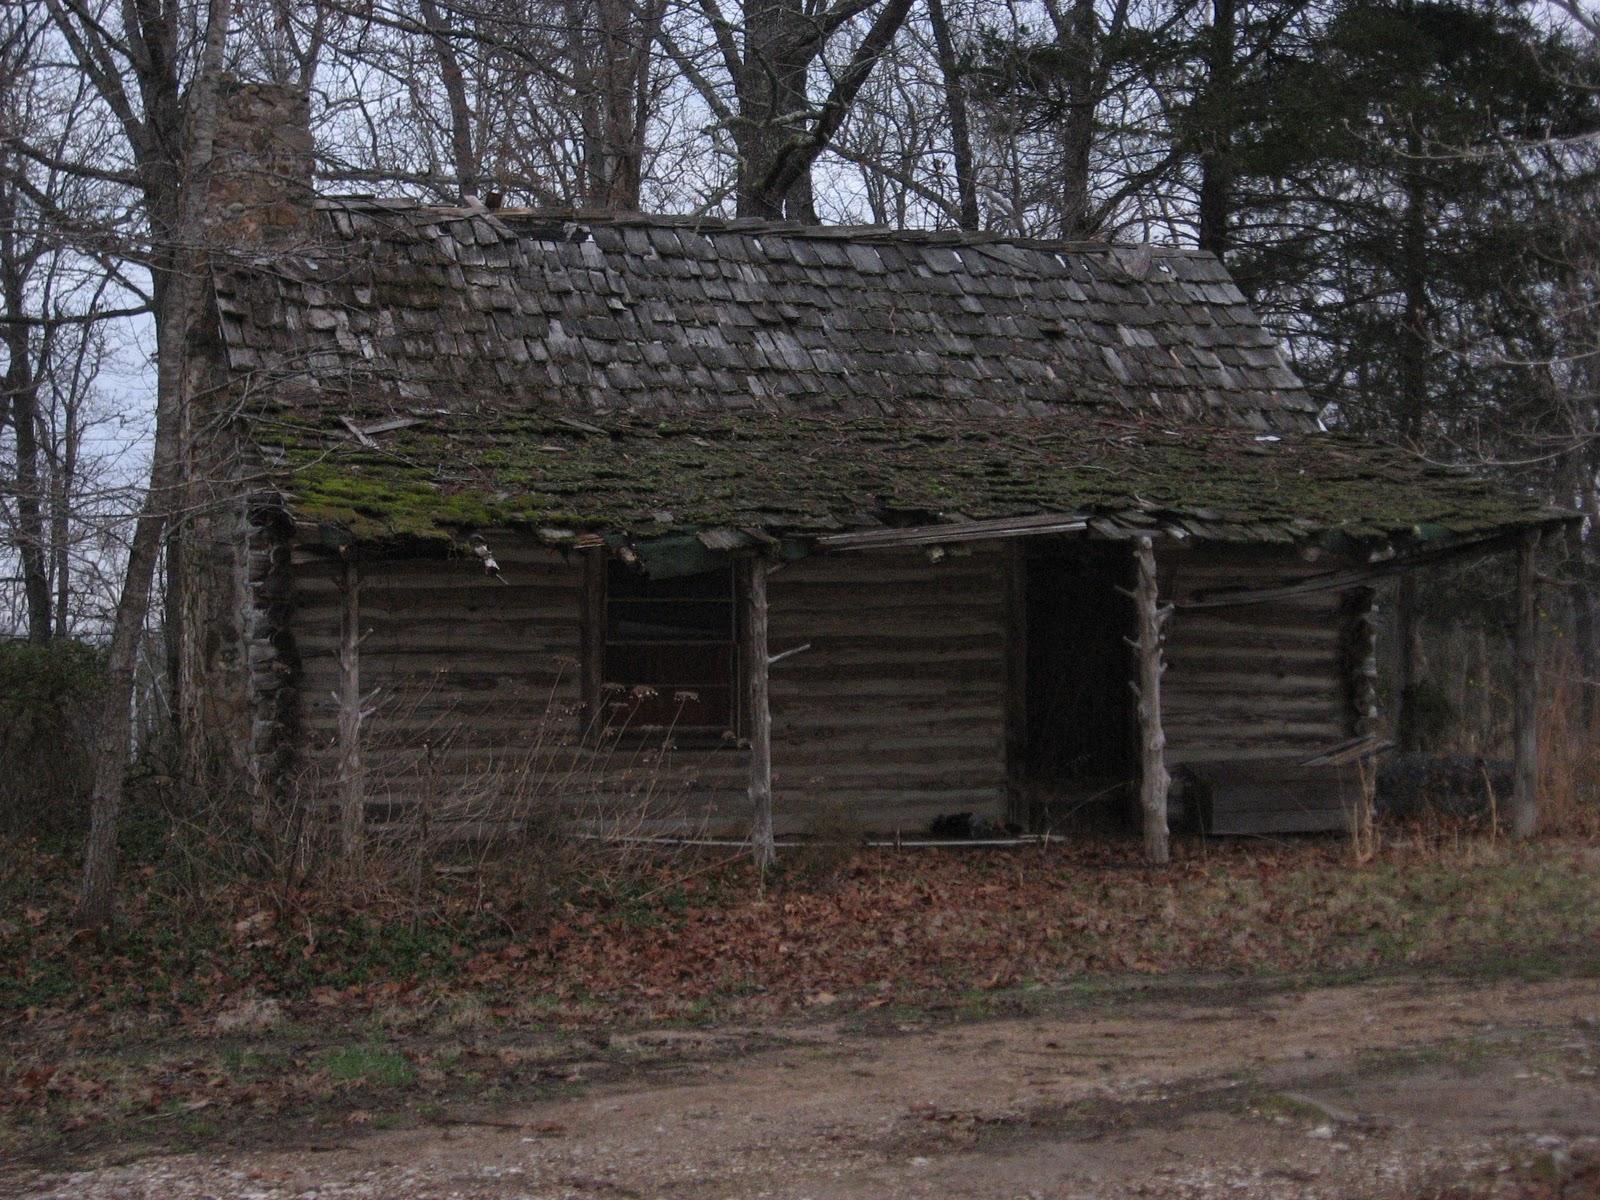 Ozarks tiny cabins blog old log cabins for Old rustic cabins